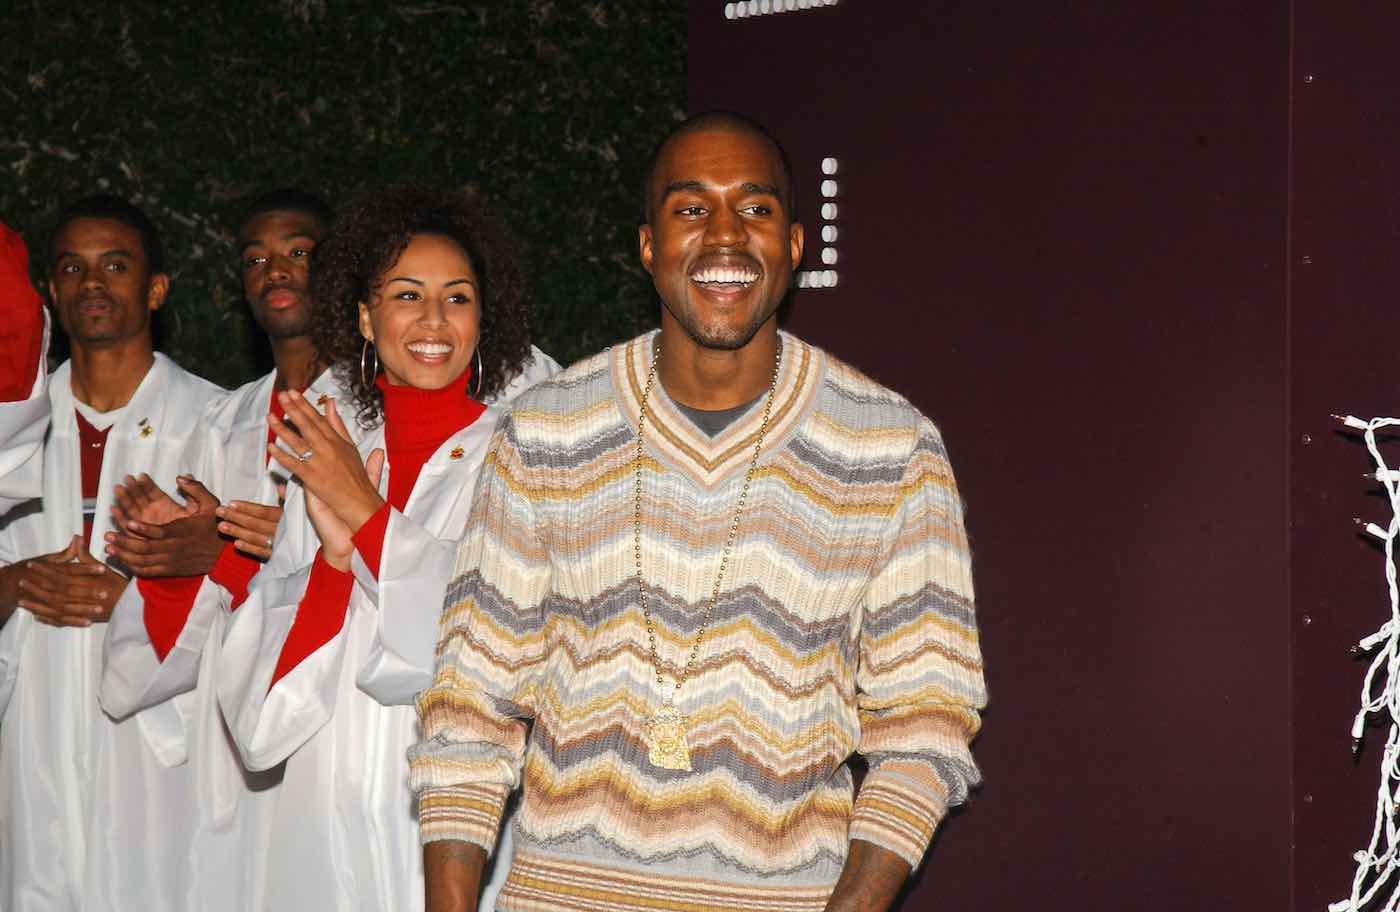 La fortuna de Kanye West se dispara a $6,6 mil millones